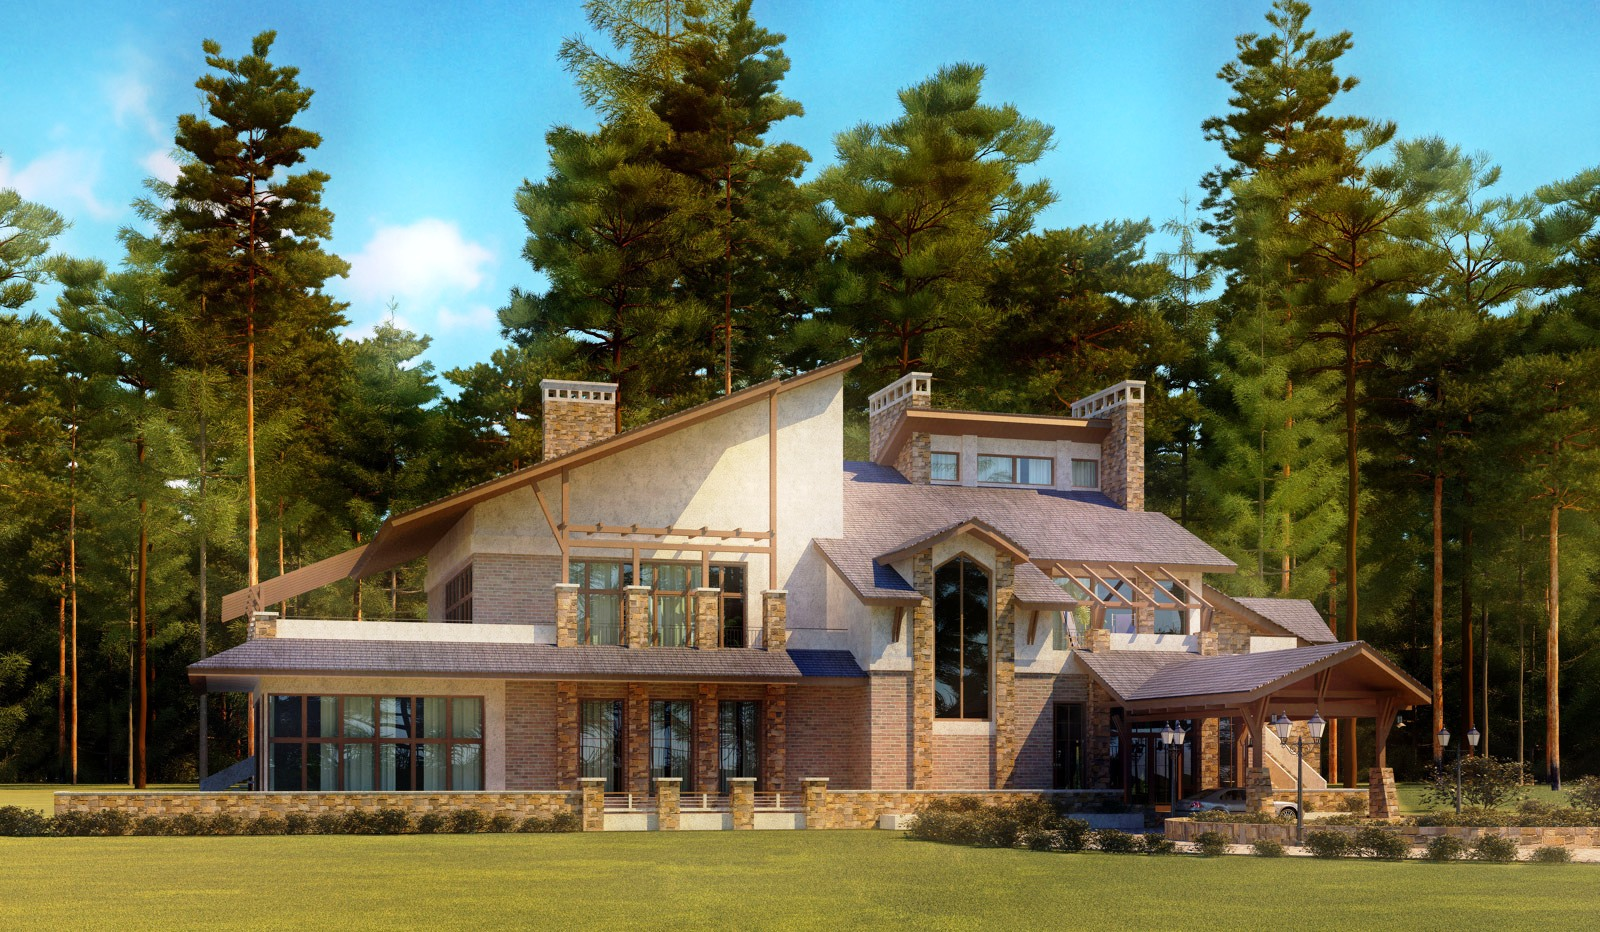 casatreschic interior  America    s Best House Plans   House Plan    America    s Best House Plans   House Plan Designs  D Front ELevation